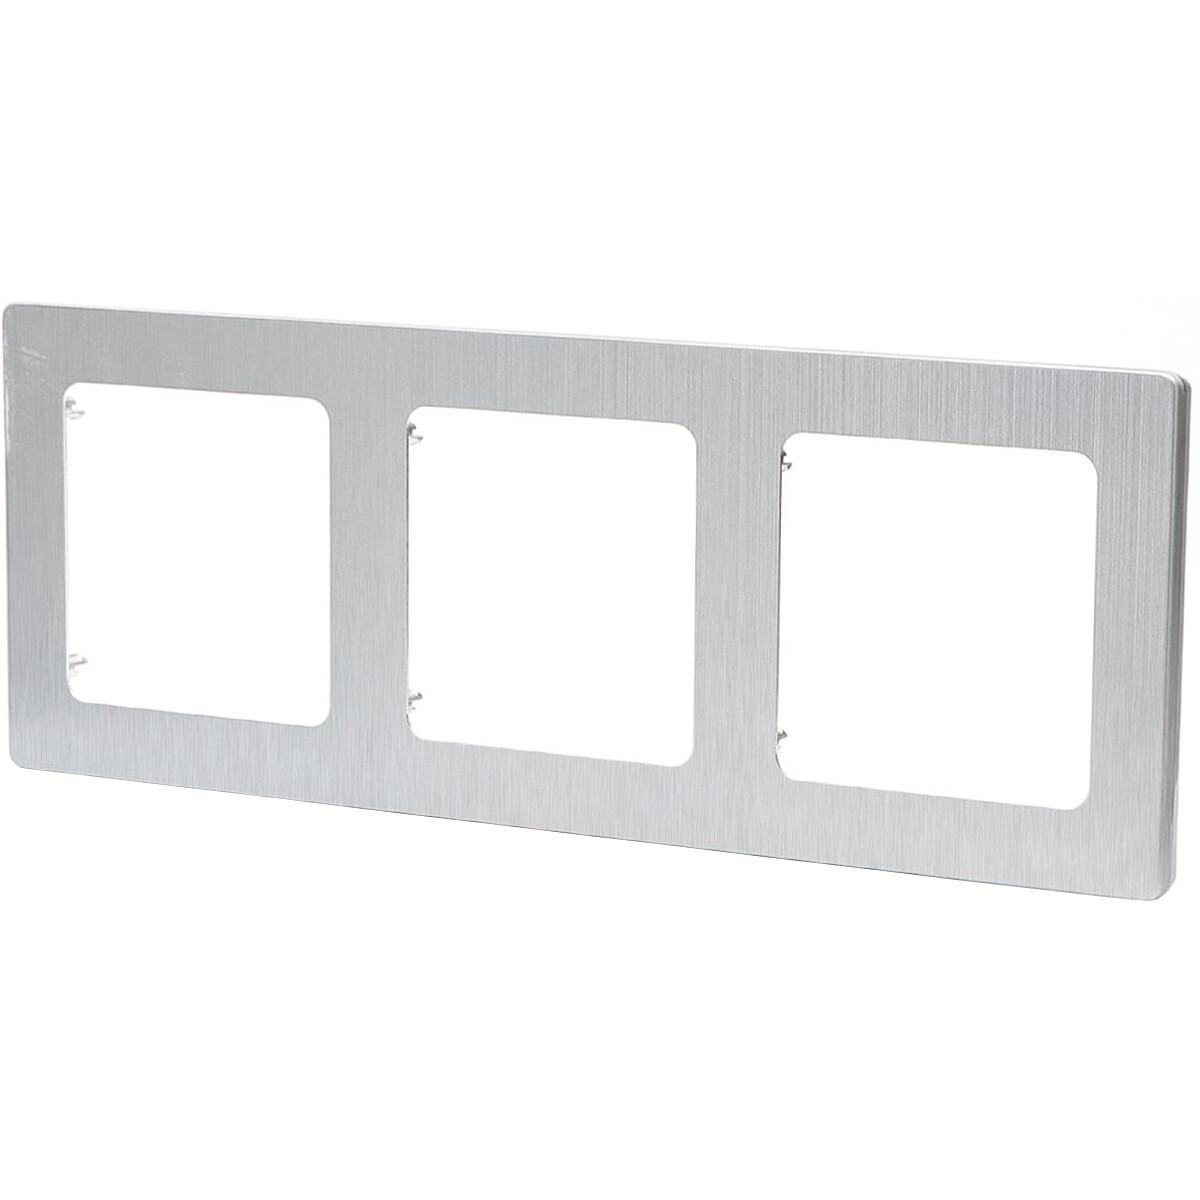 Afdekraam - Aigi Jura - 3-voudig - Vierkant - Aluminium - Zilver